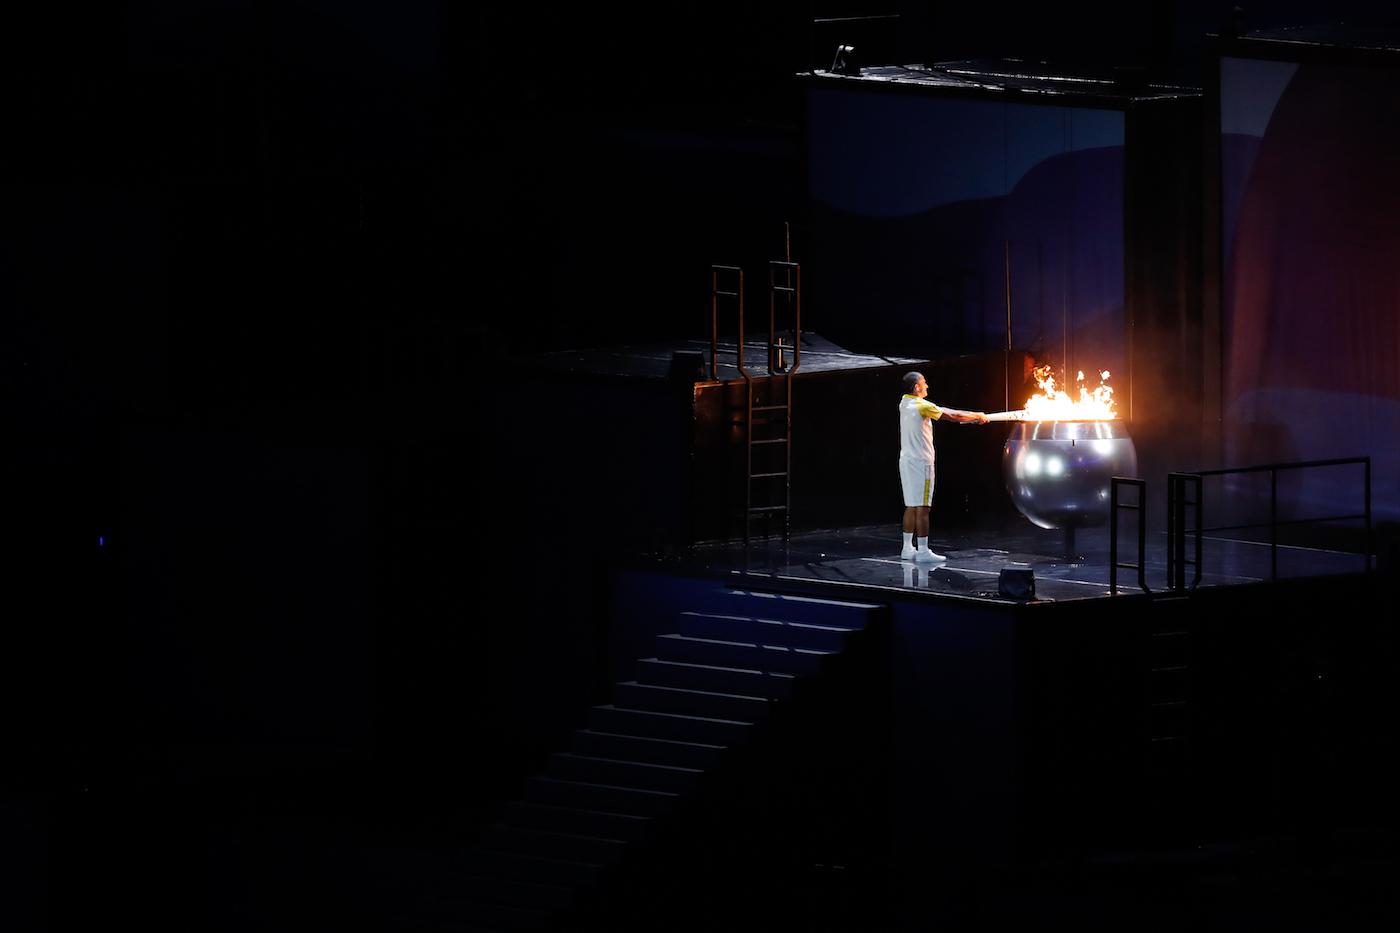 The lighting of the cauldron for the Rio 2016 Olympics (photo via Agência Brasil/Wikimedia)